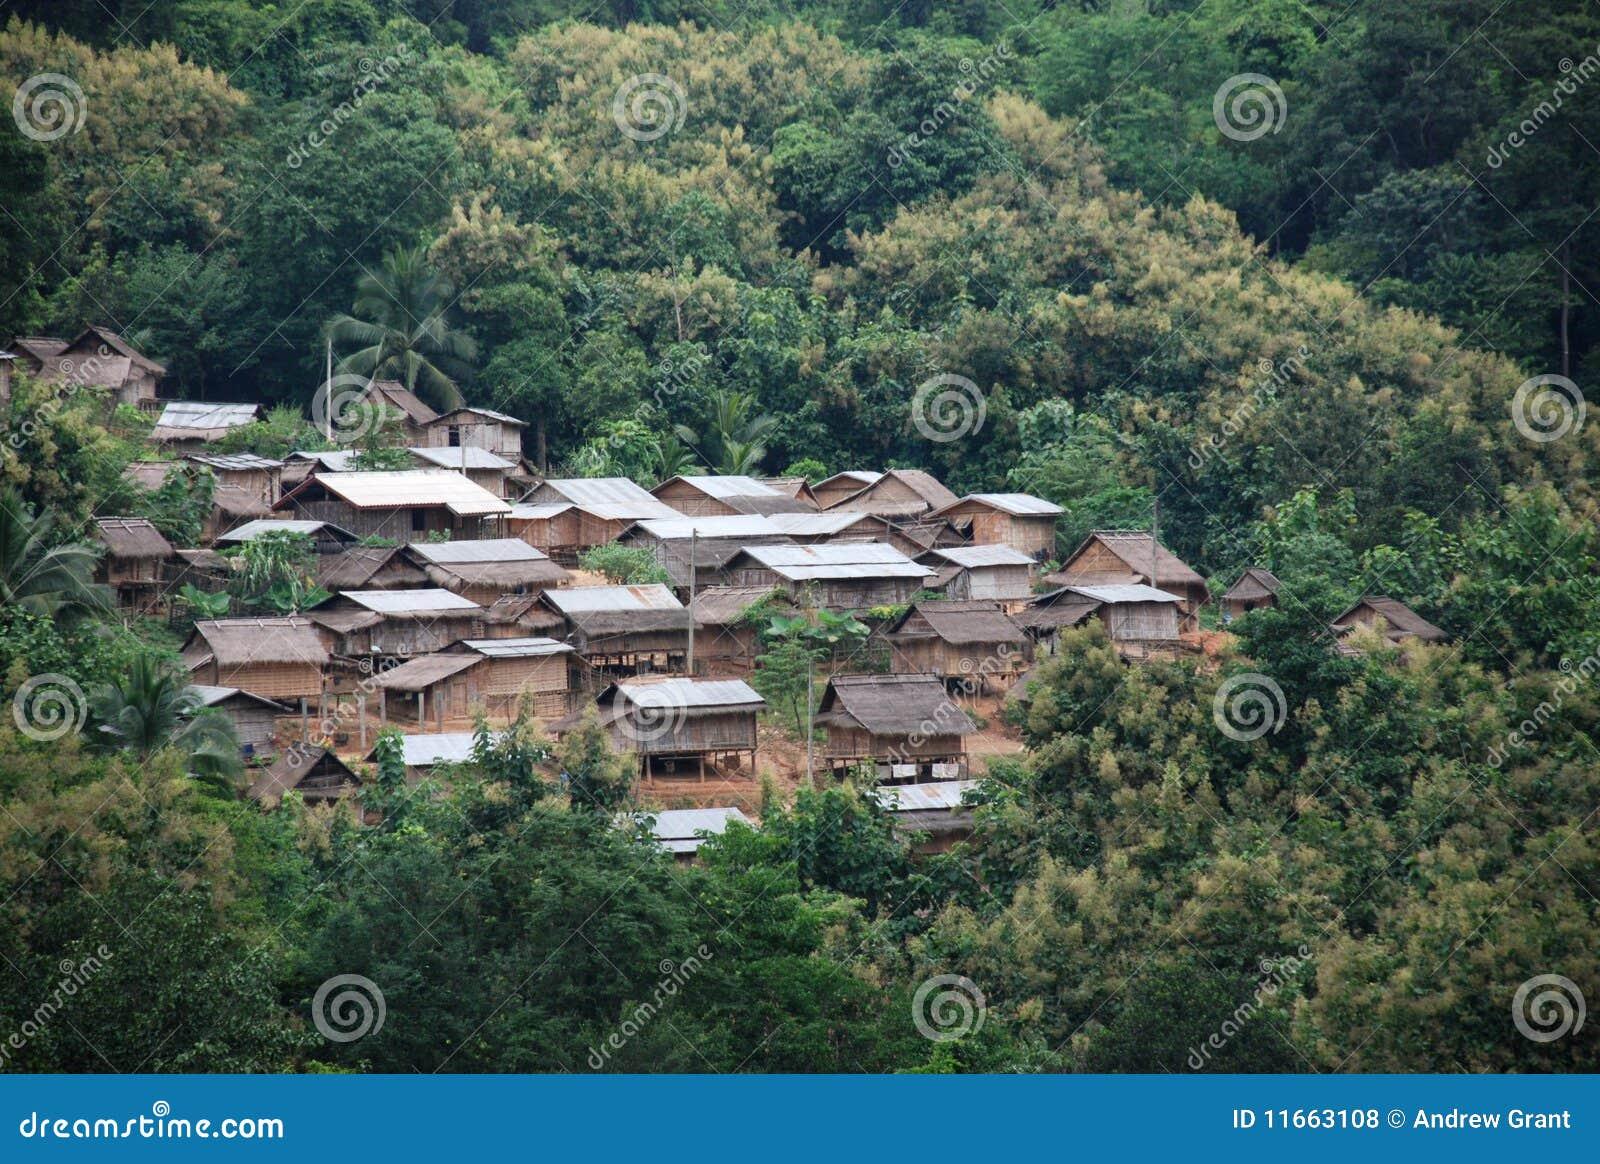 Asian new village